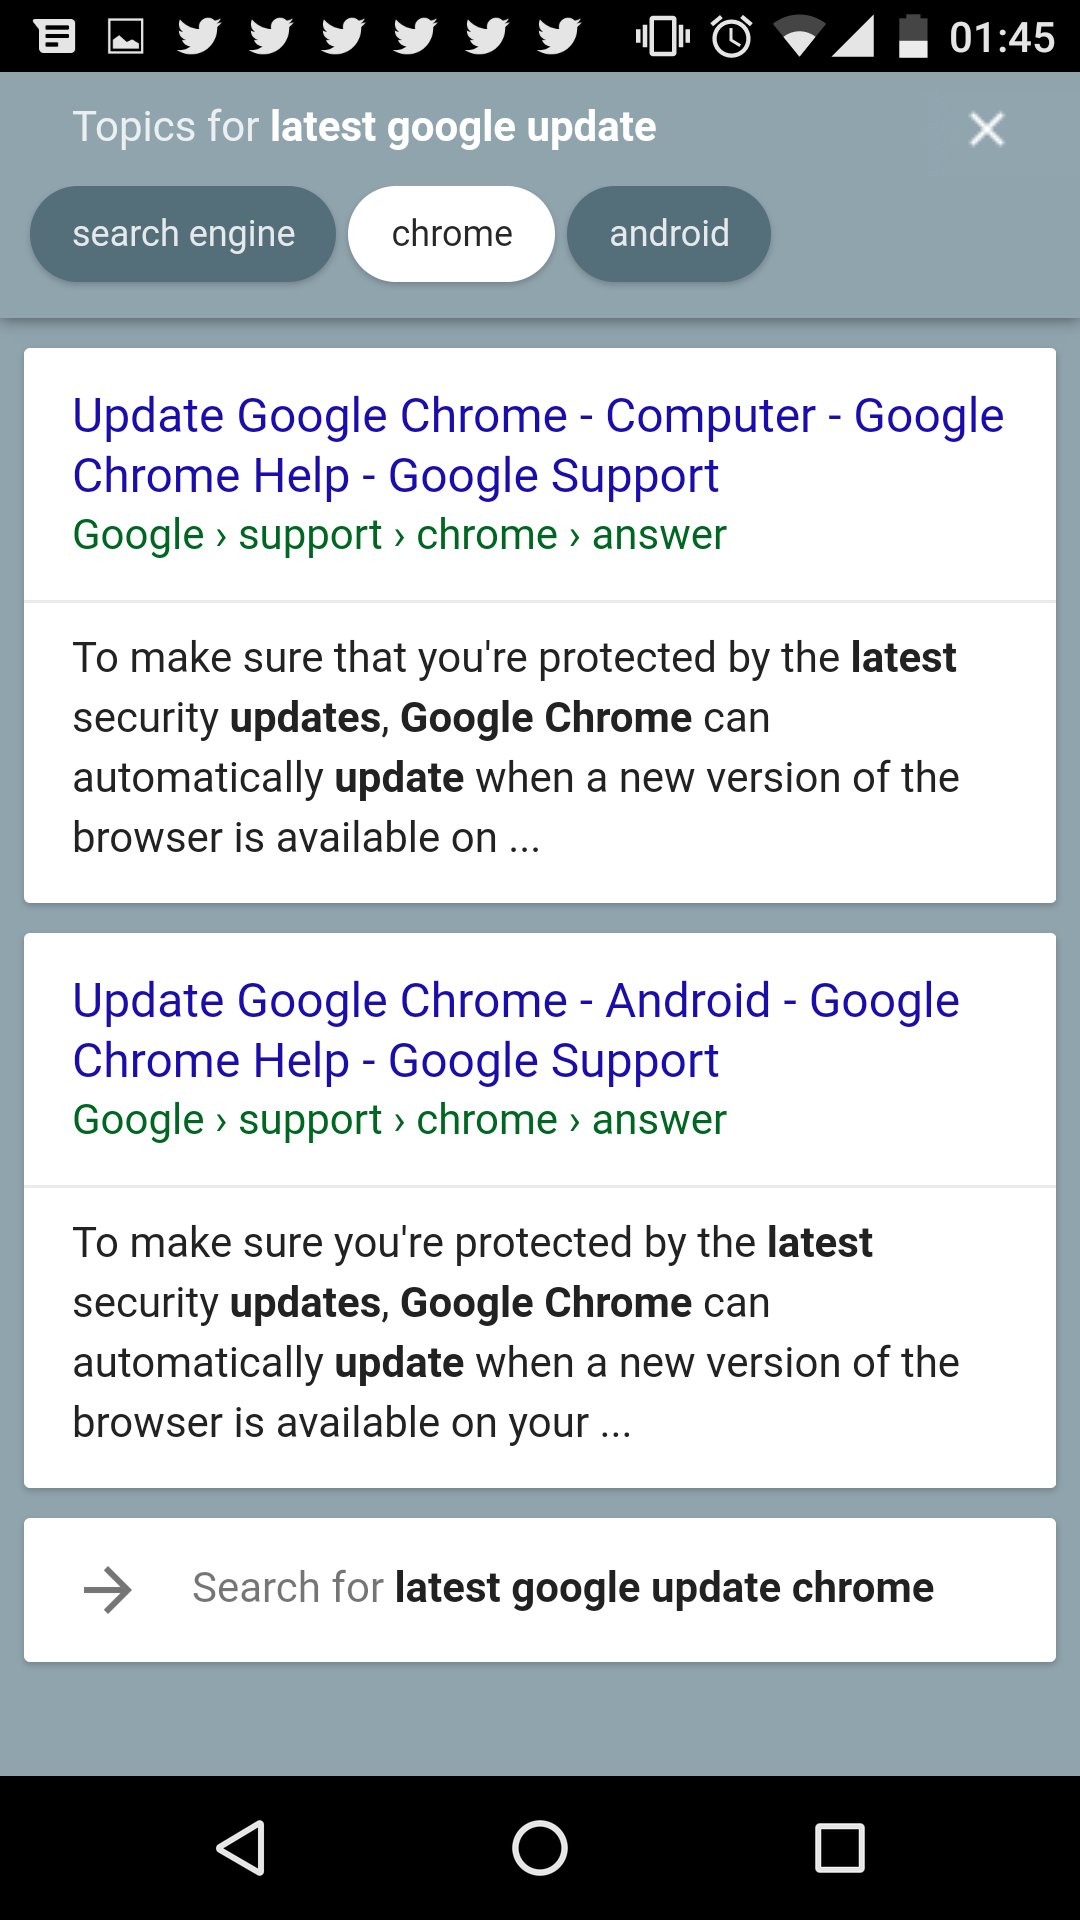 google-topics-2